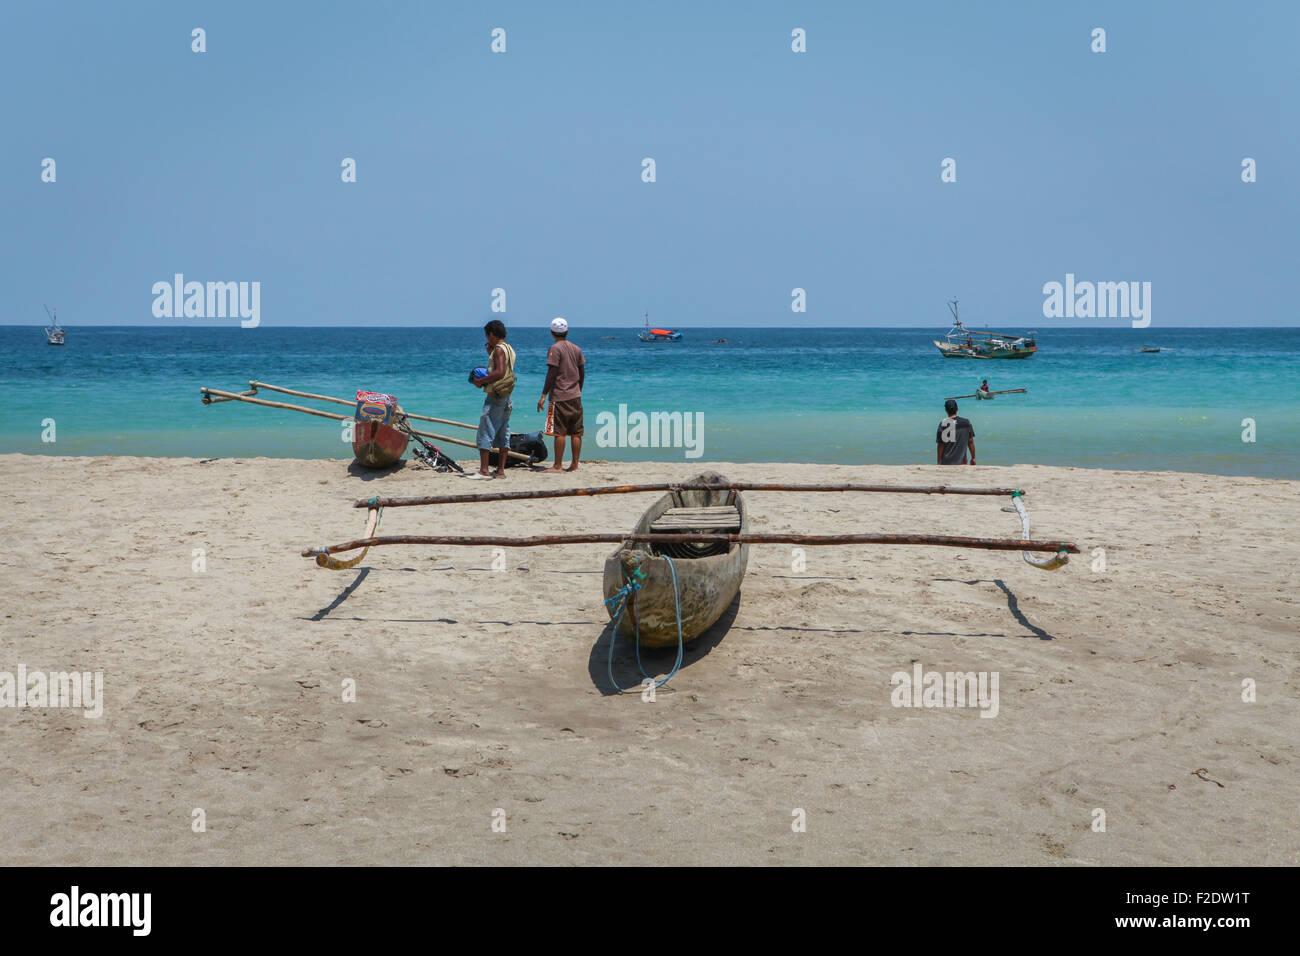 Men And Wooden Canoe At Tropical Beach Of Sumba Island Facing Indian Ocean